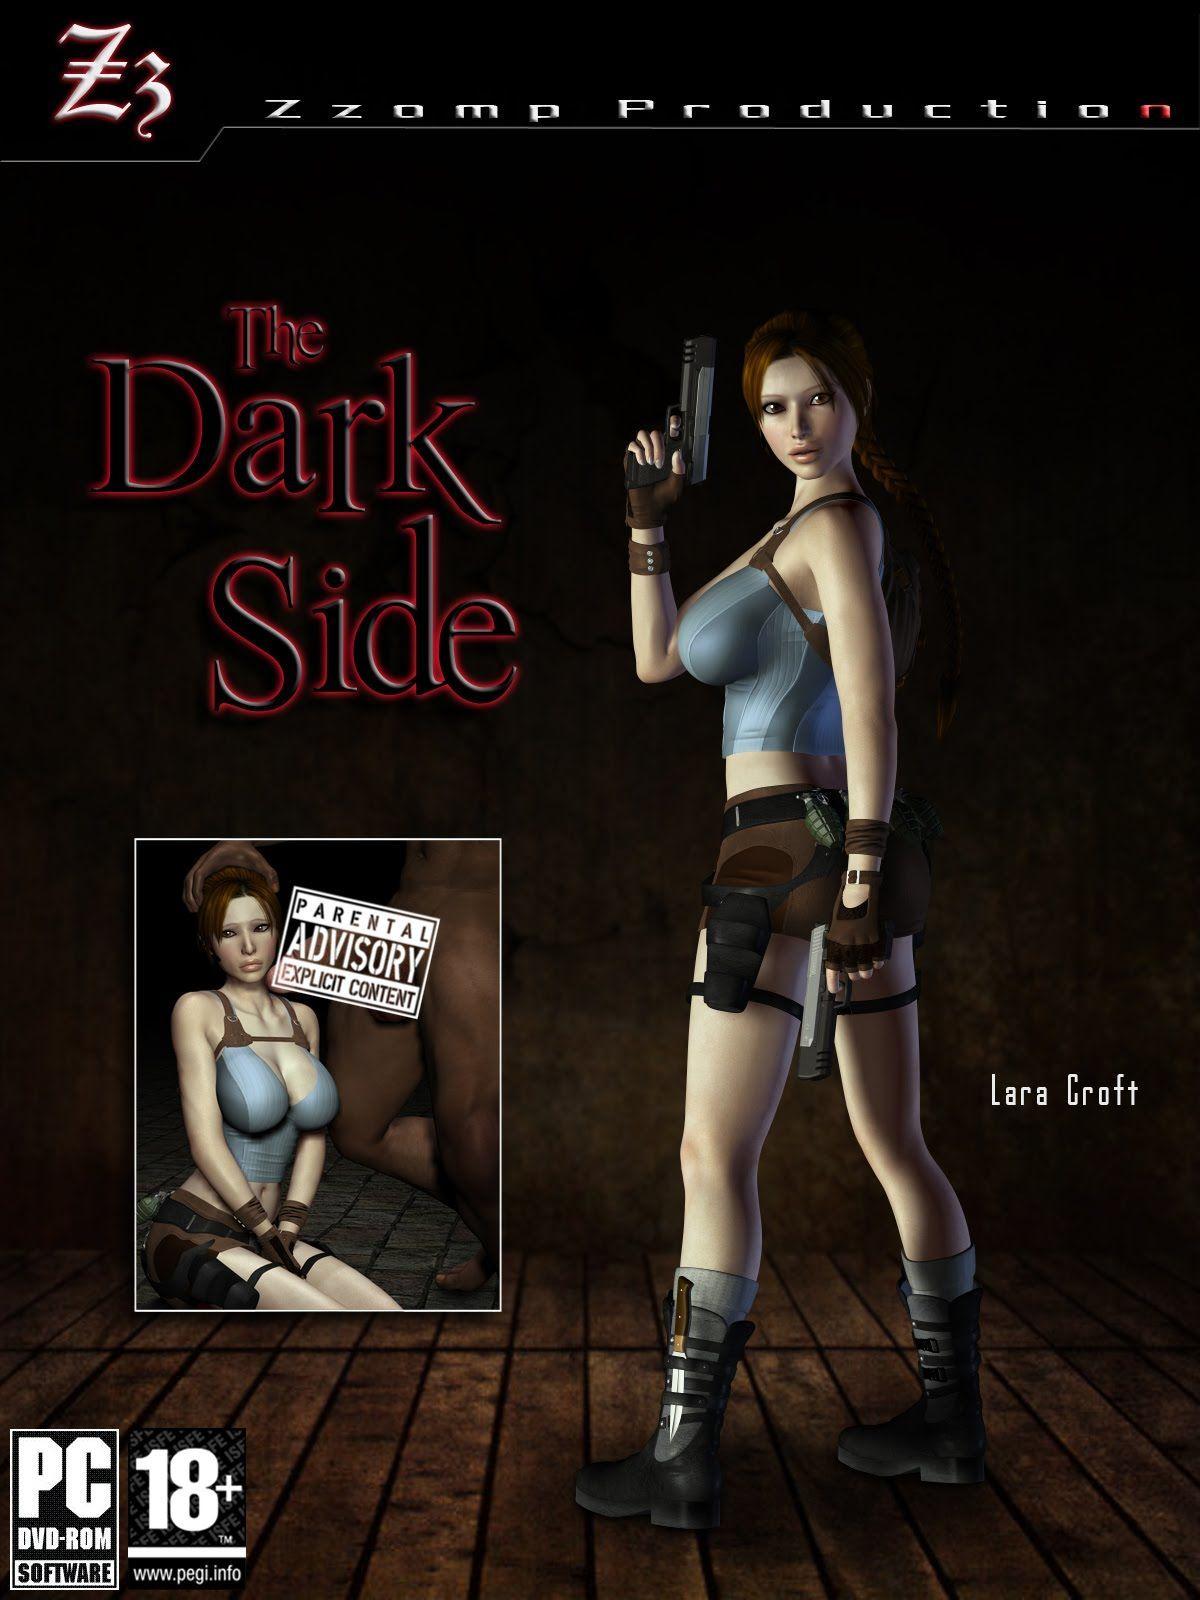 [Zzomp] The Dark Side of Lara